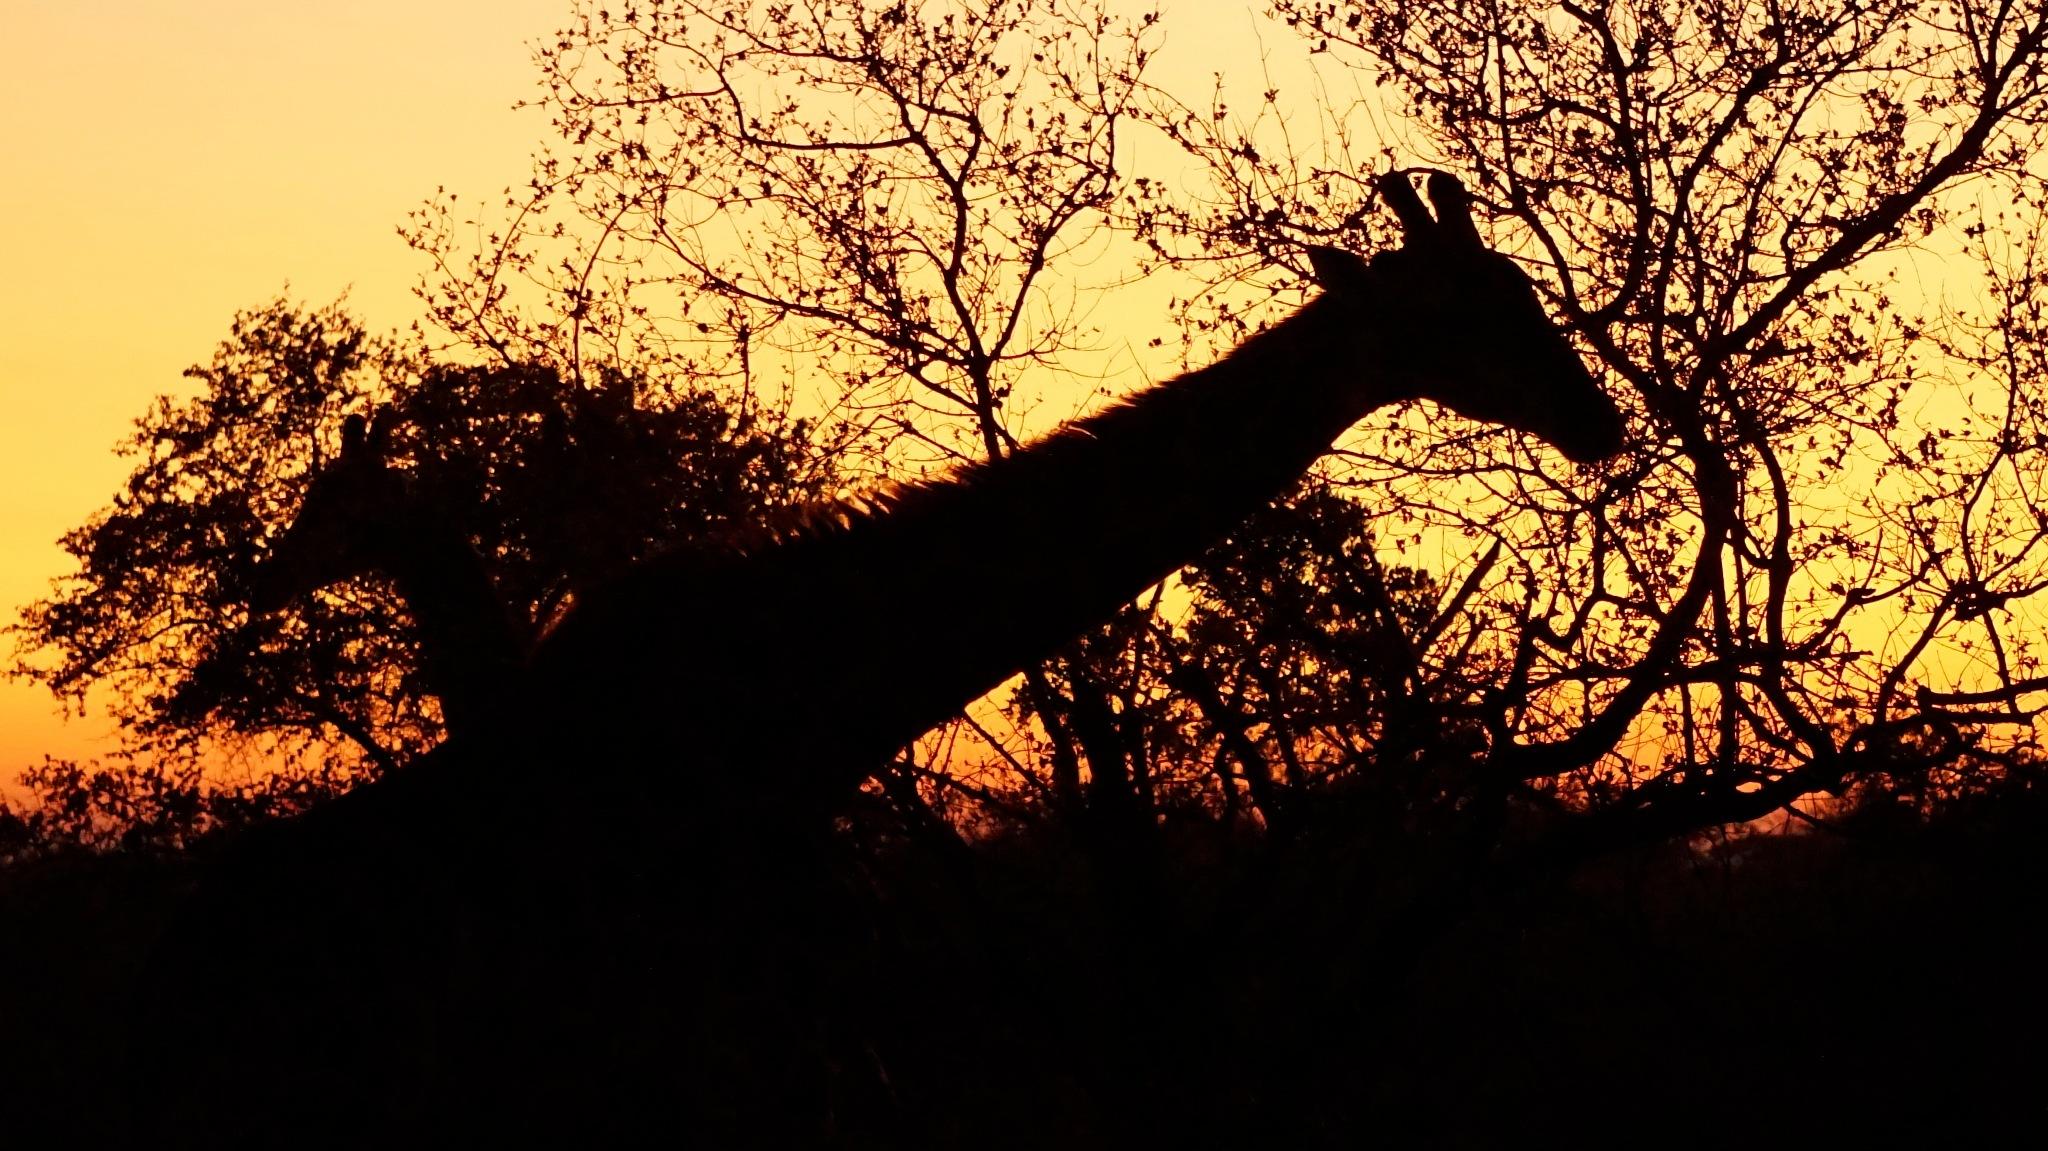 Sunset  by Florian B